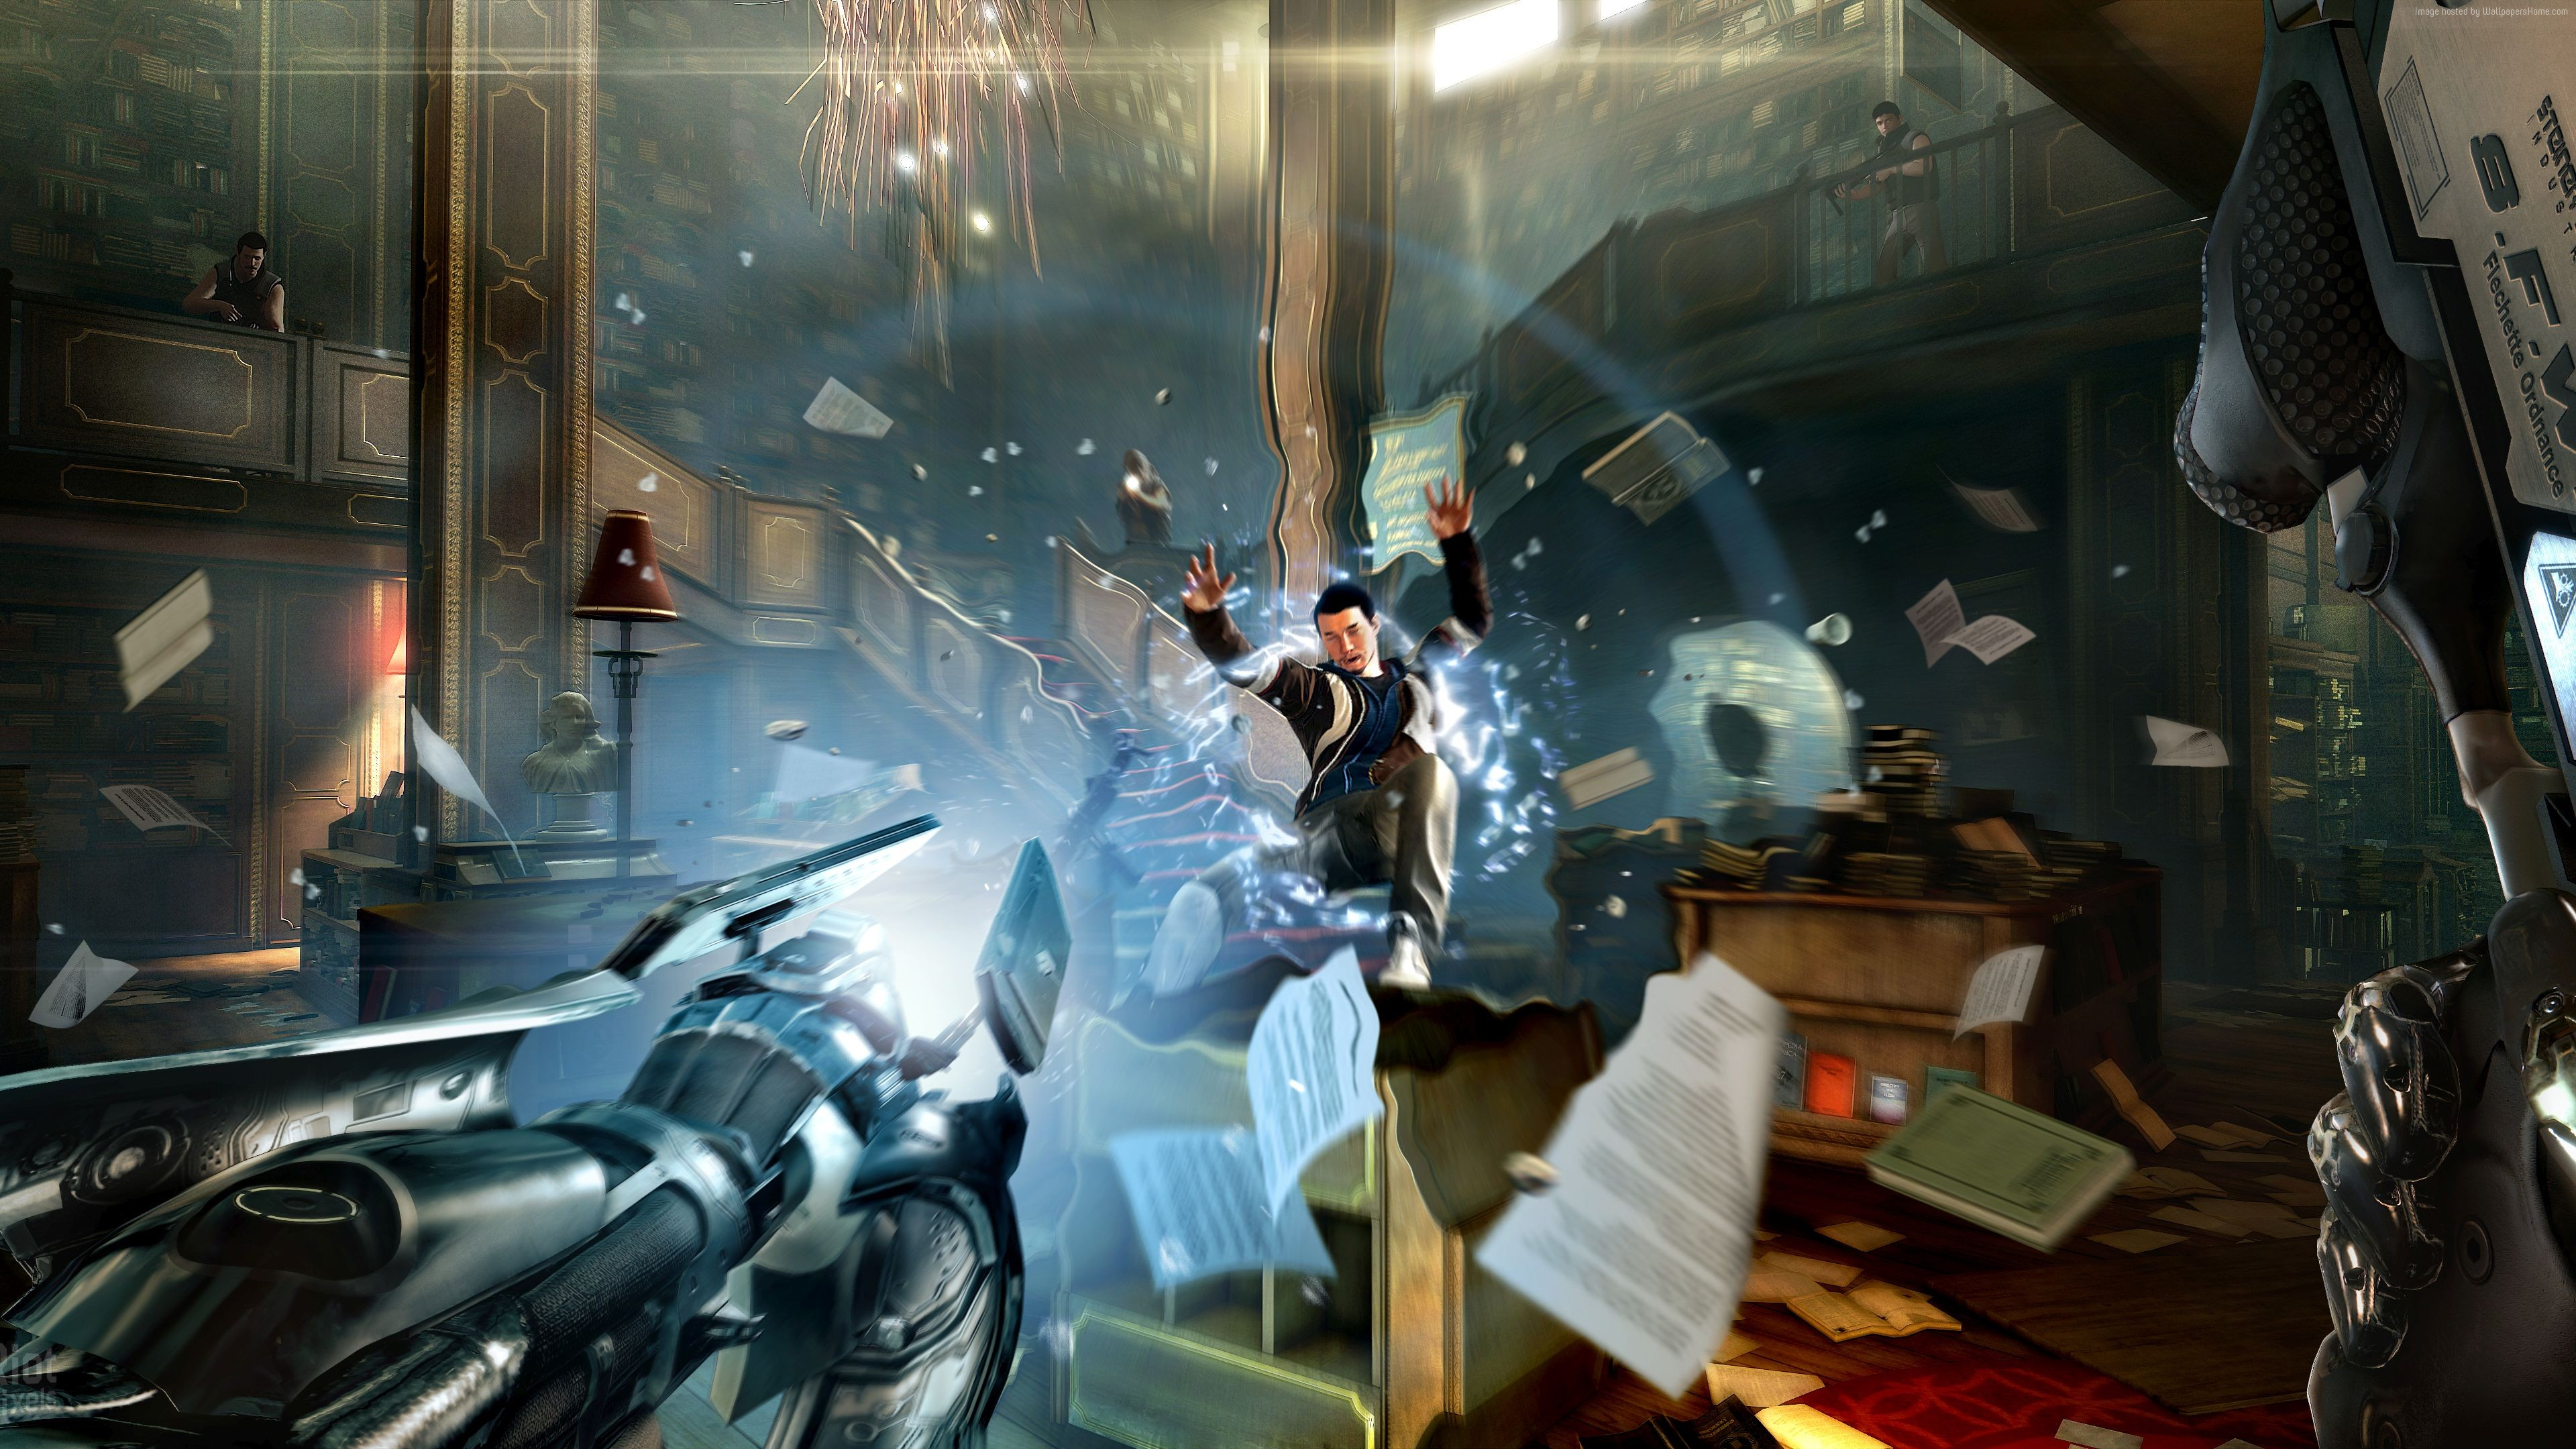 Deus Ex Mankind Divided 4k Hd Games 4k Wallpapers Images